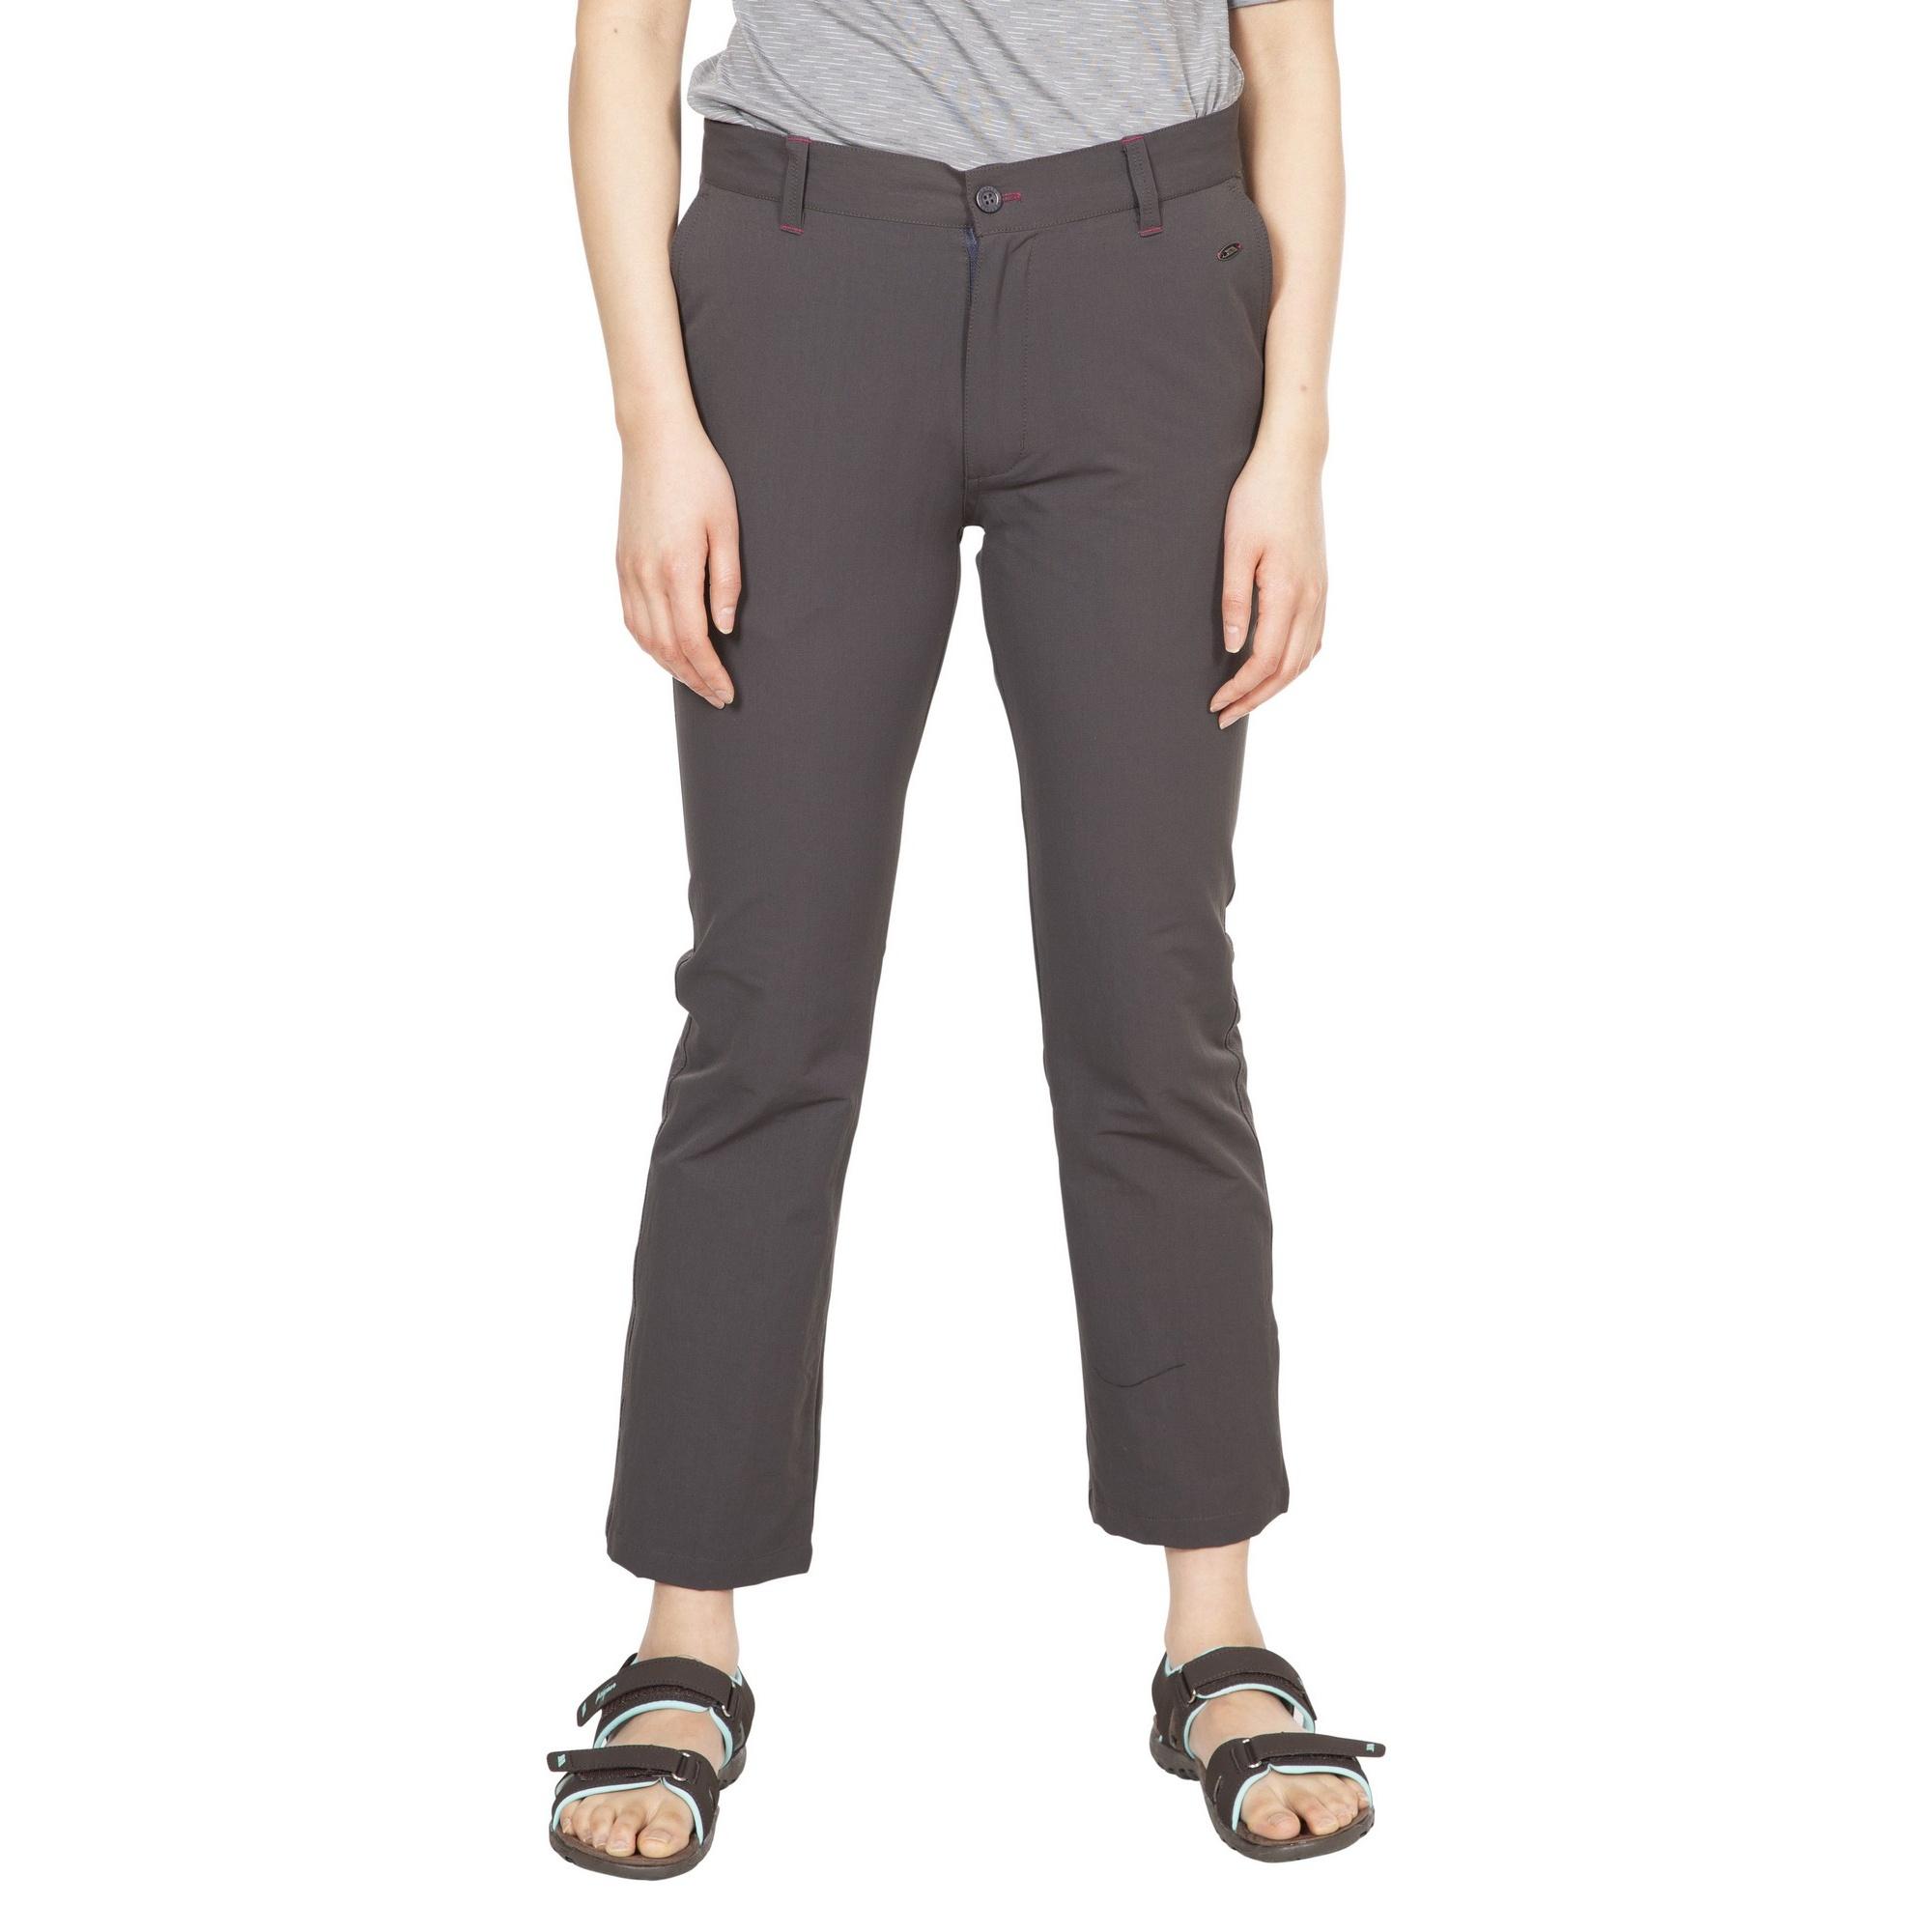 Trespass Womens/Ladies Zulu Cropped Trousers (16 UK) (Dark Grey)